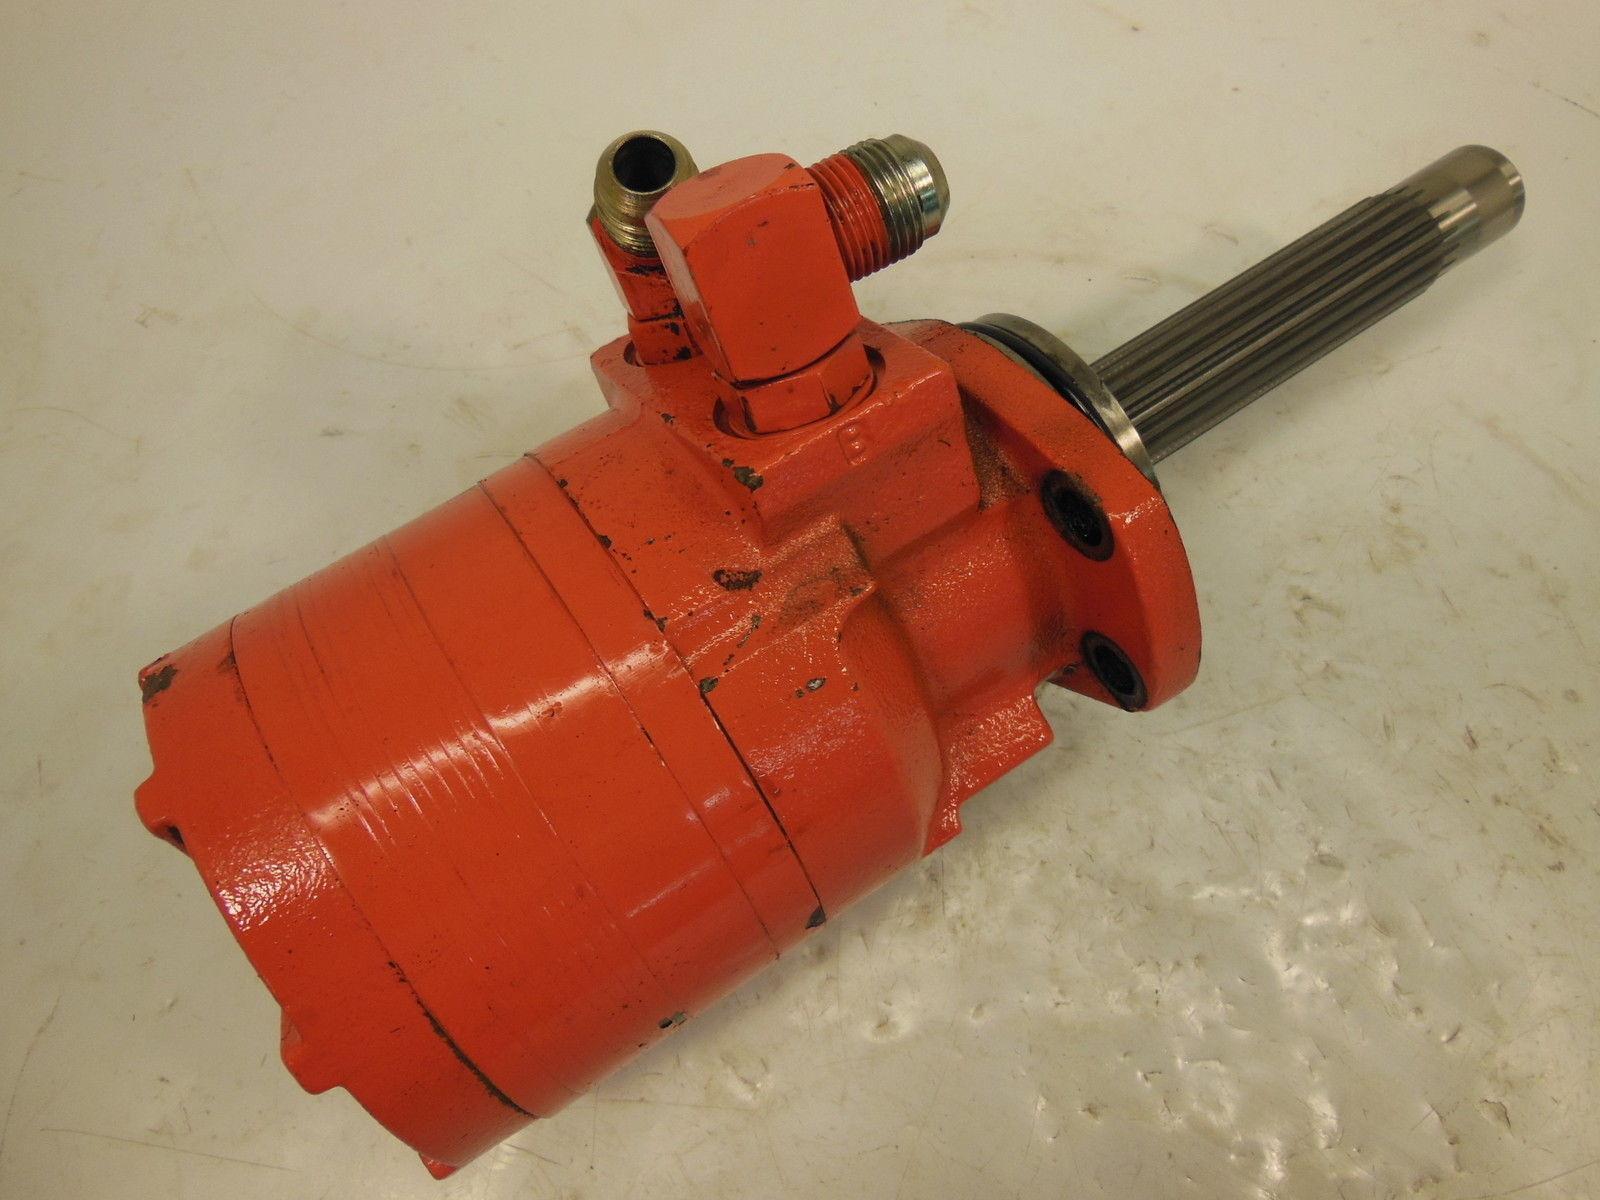 Case Garden Tractor Hydraulic Pump : Case ingersoll tractor hydraulic pump motor good